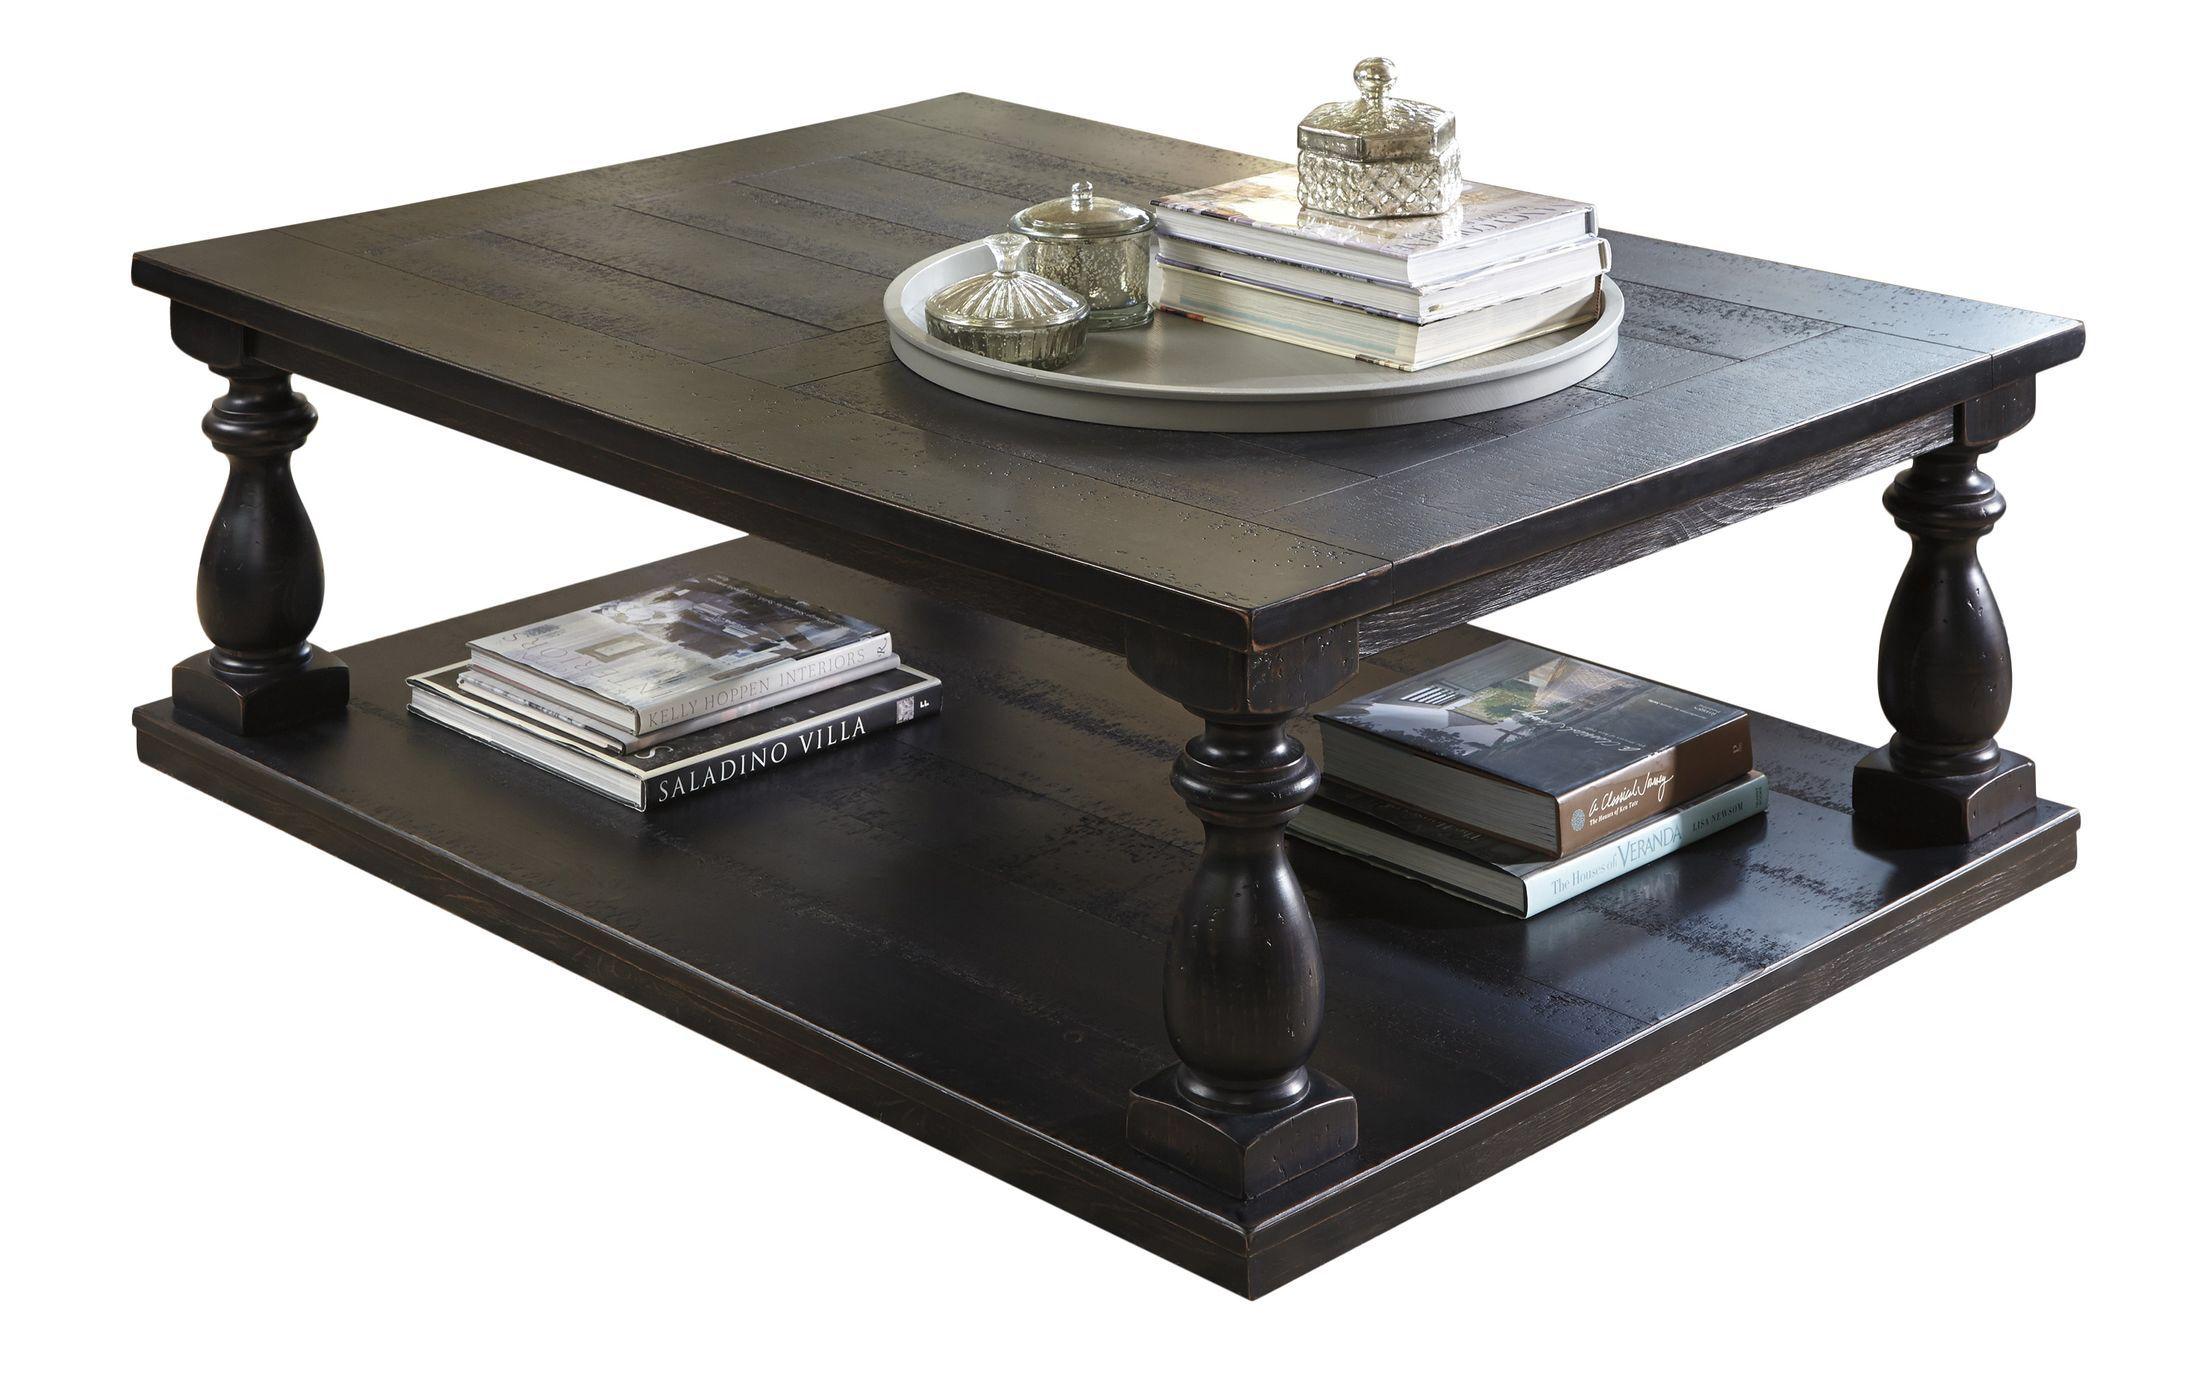 Coffee Table Lift Top Coffee Table Redo Progressive Furniture Coffee Table [ 2127 x 2127 Pixel ]